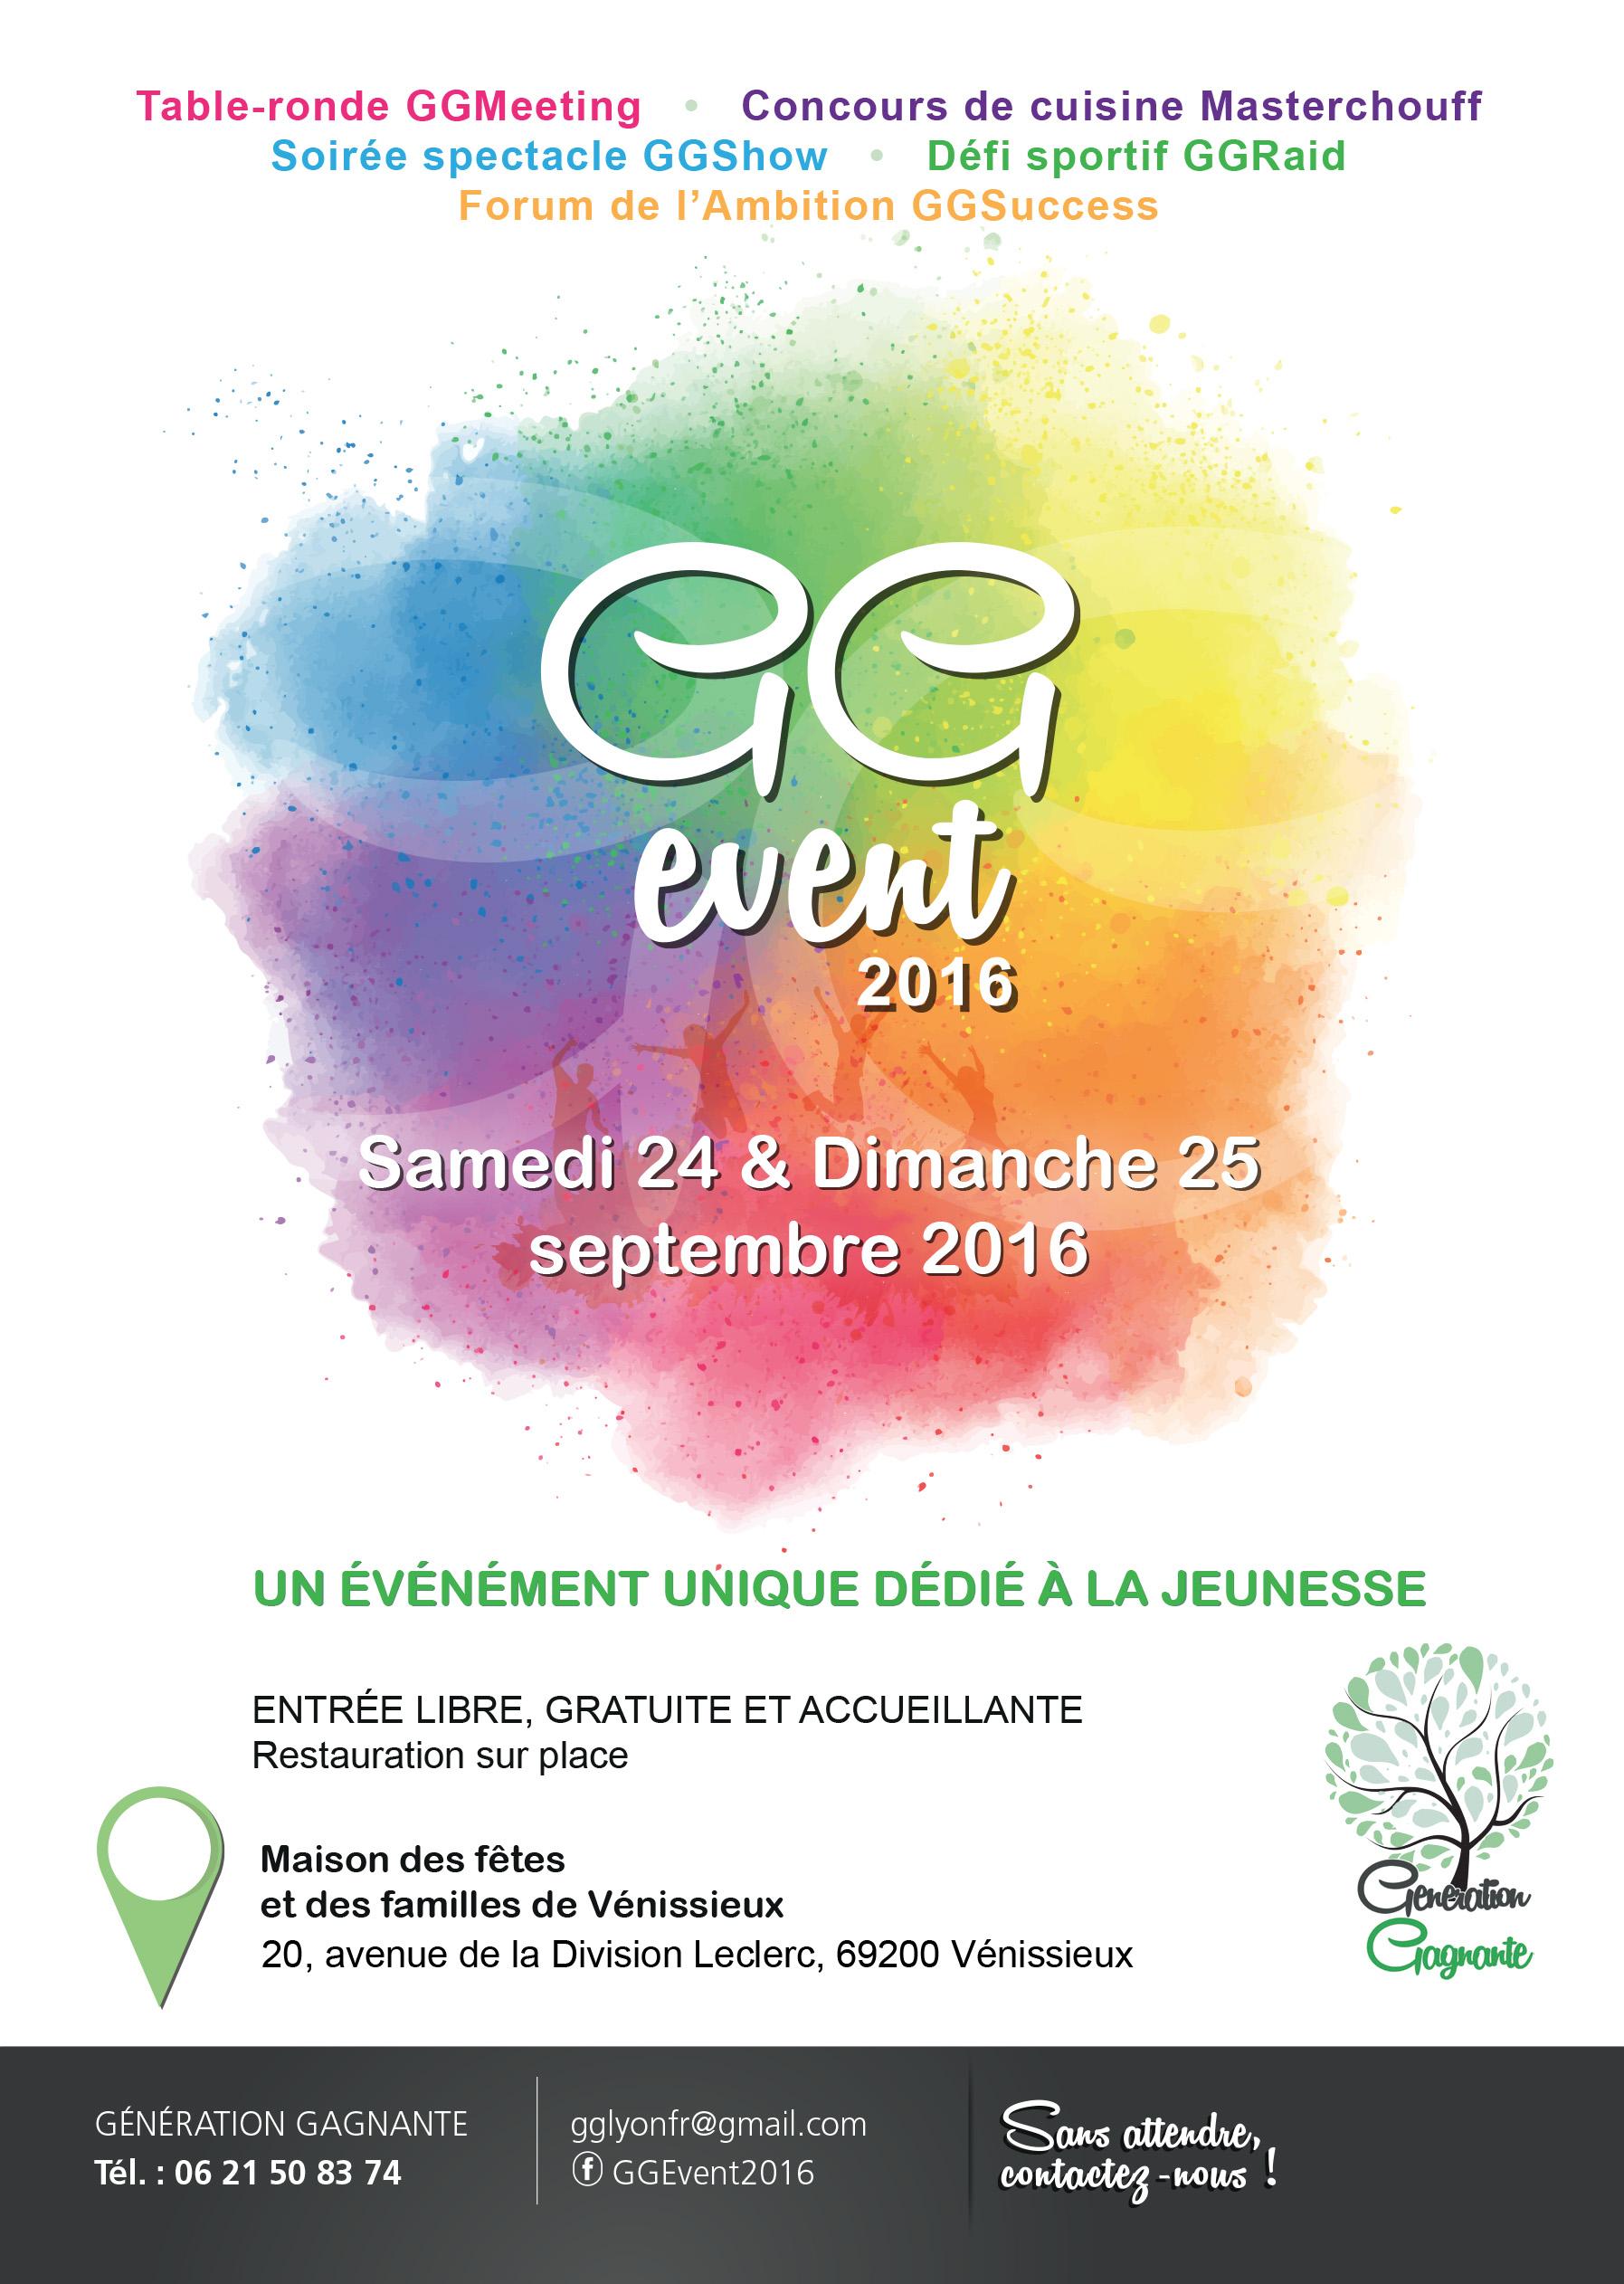 http://www.saphirnews.com/agenda/GGEvent2016-Plantons-les-graines-de-demain-_ae412754.html